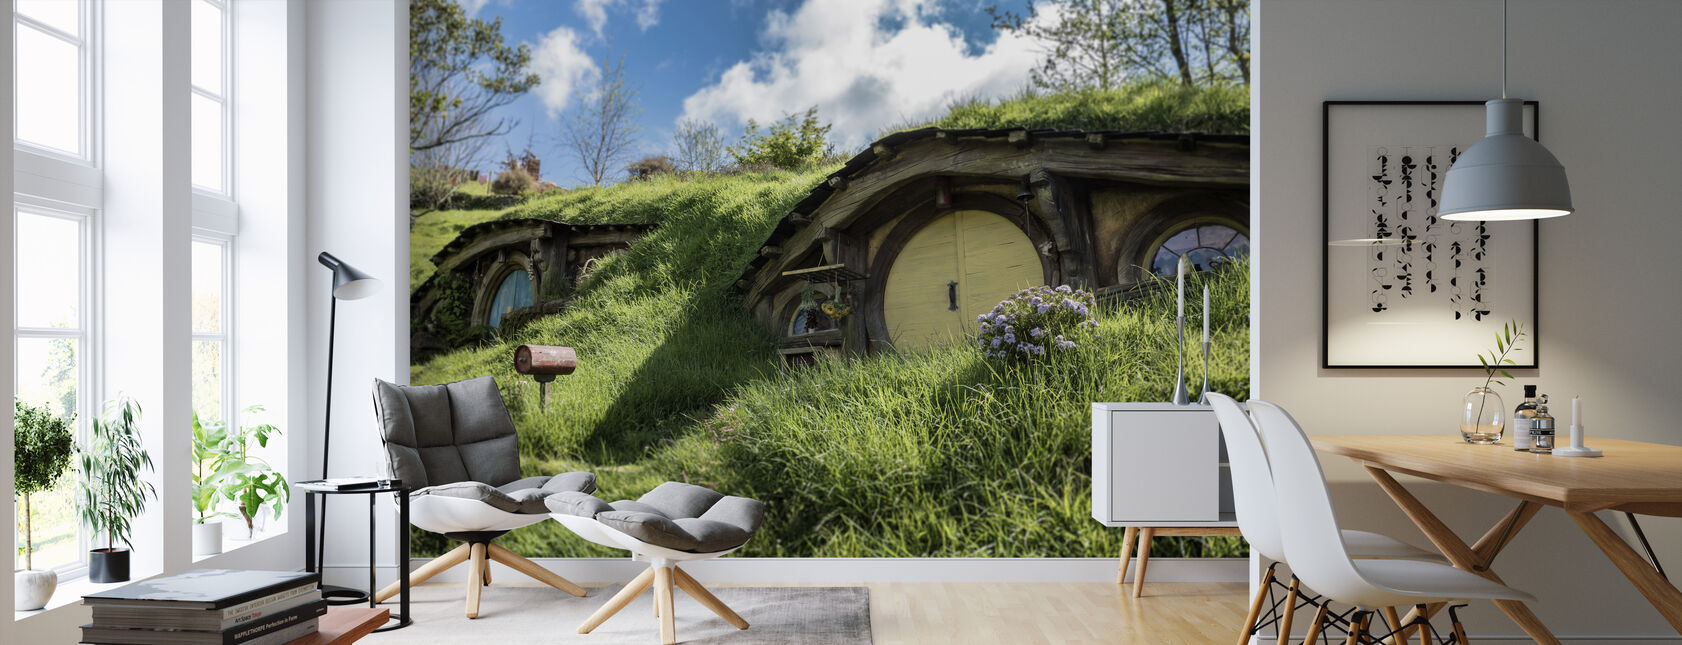 Hobbiton Movie House - Wallpaper - Living Room